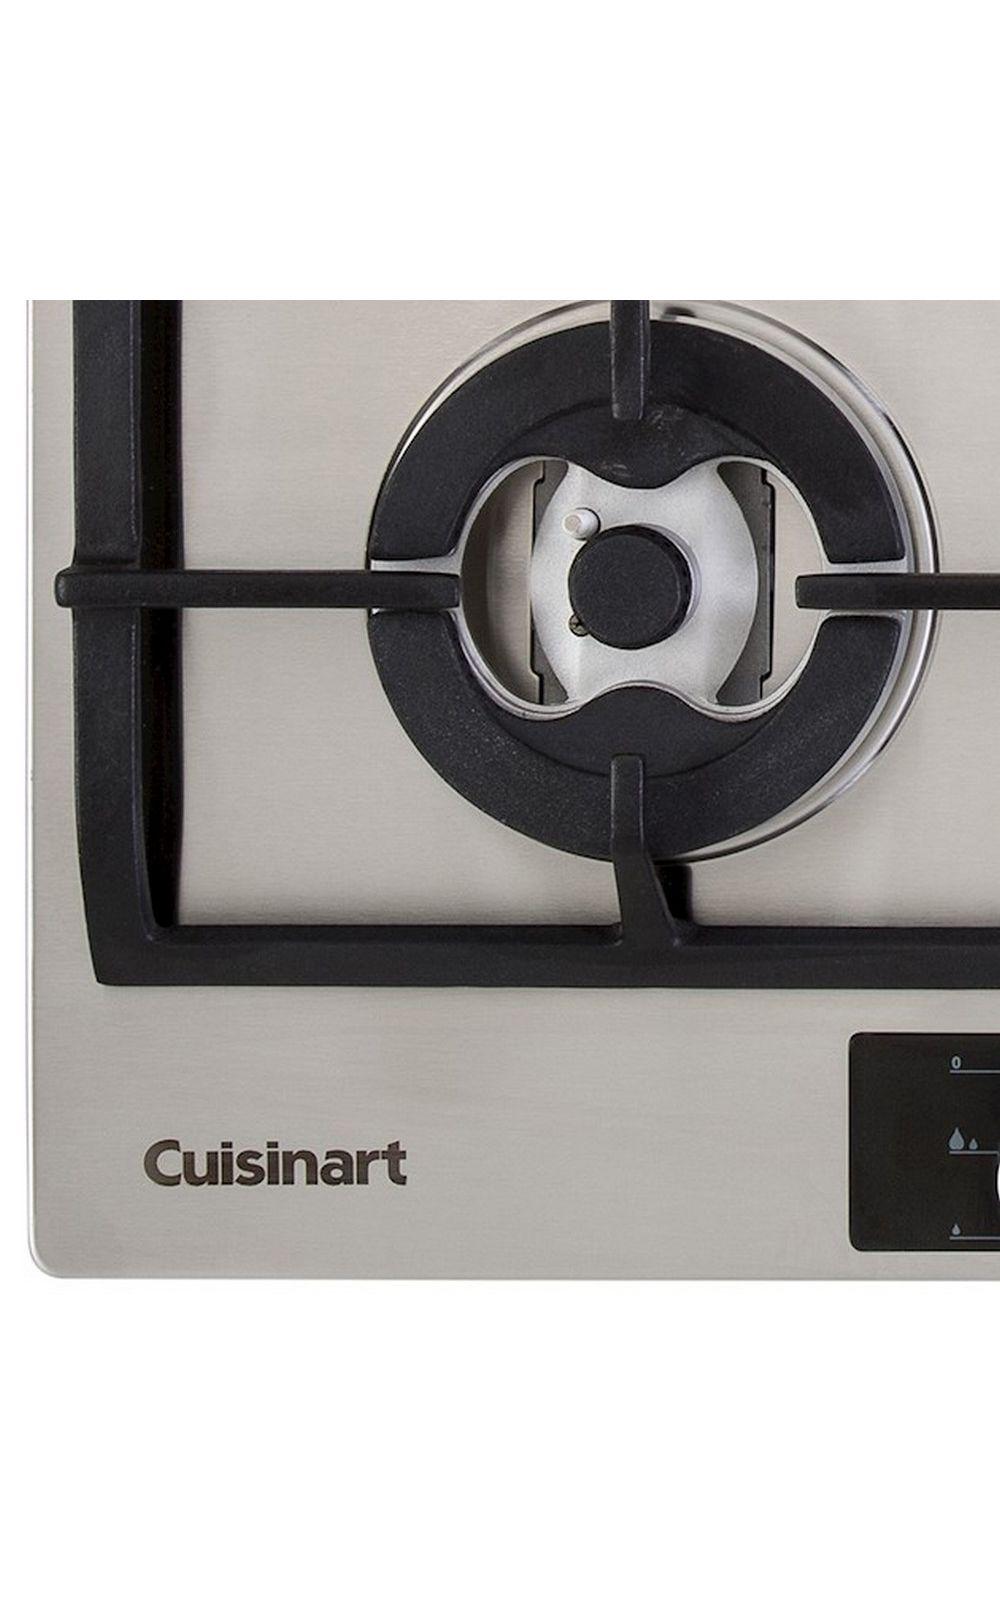 Foto 3 - Cooktop a Gás com 4 Queimadores 60cm P640STX Casual Cooking 220V Cuisinart